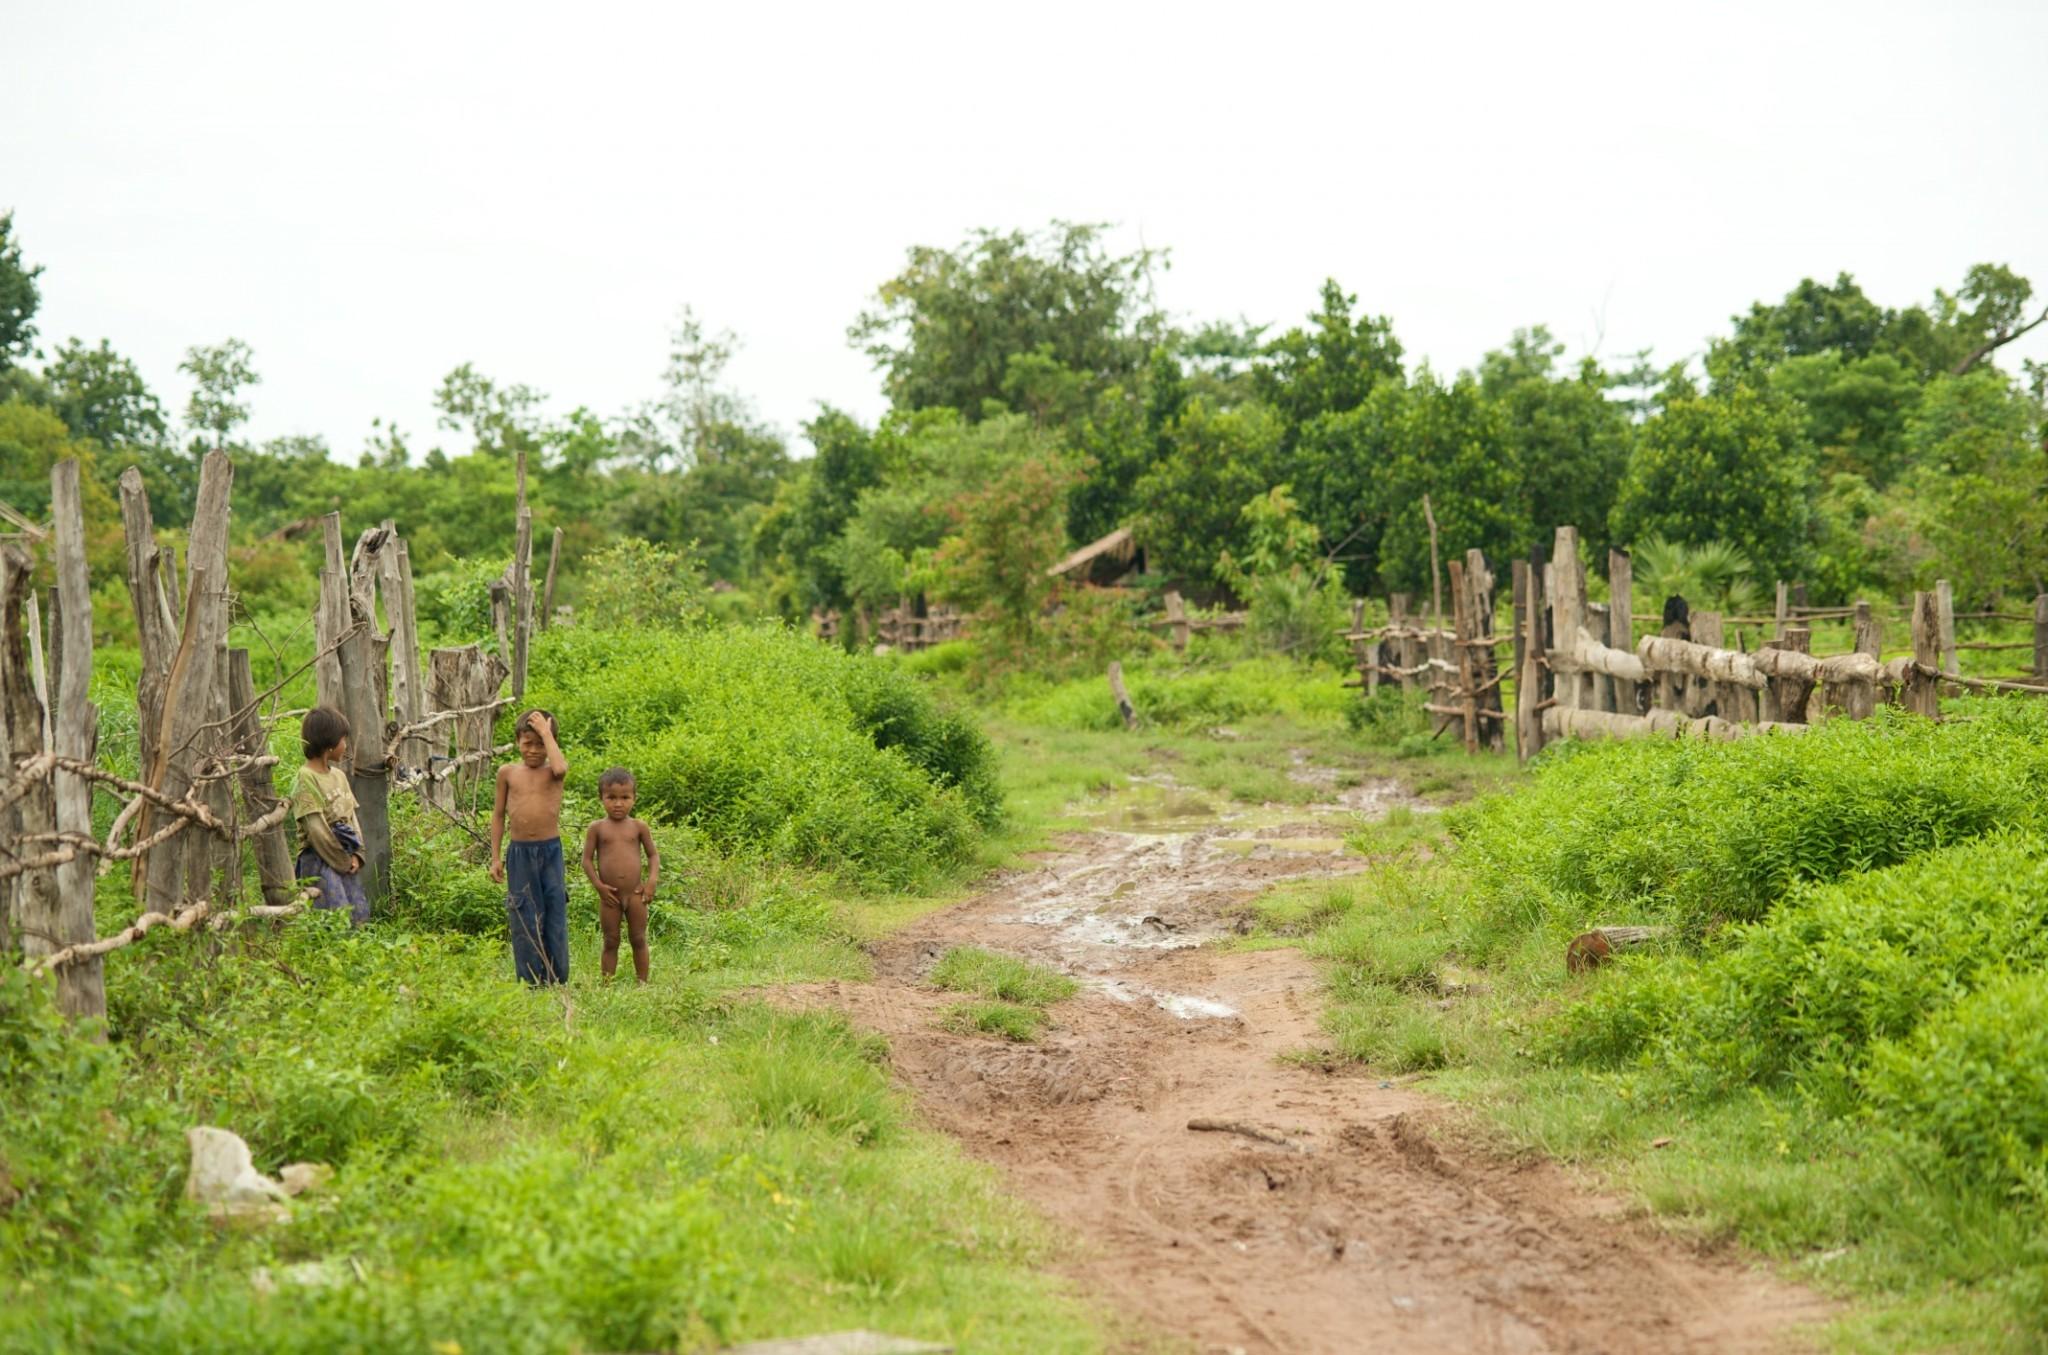 AlexSoh_July09 Cambodia175